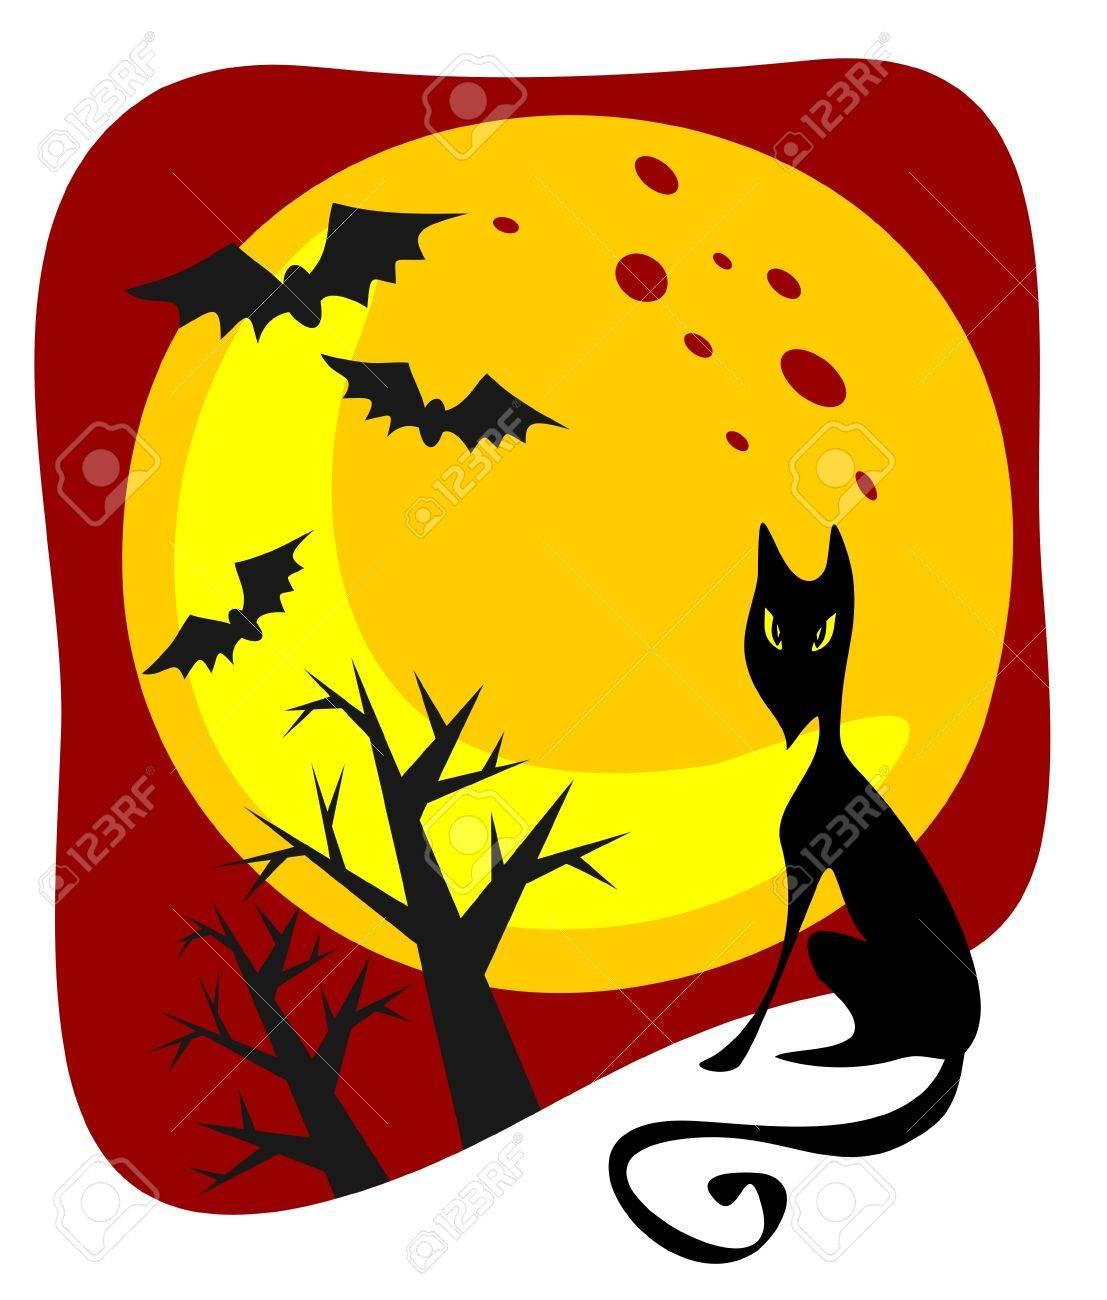 1107x1300 Cartoon Black Cat And Moon. Halloween Illustration. Royalty Free